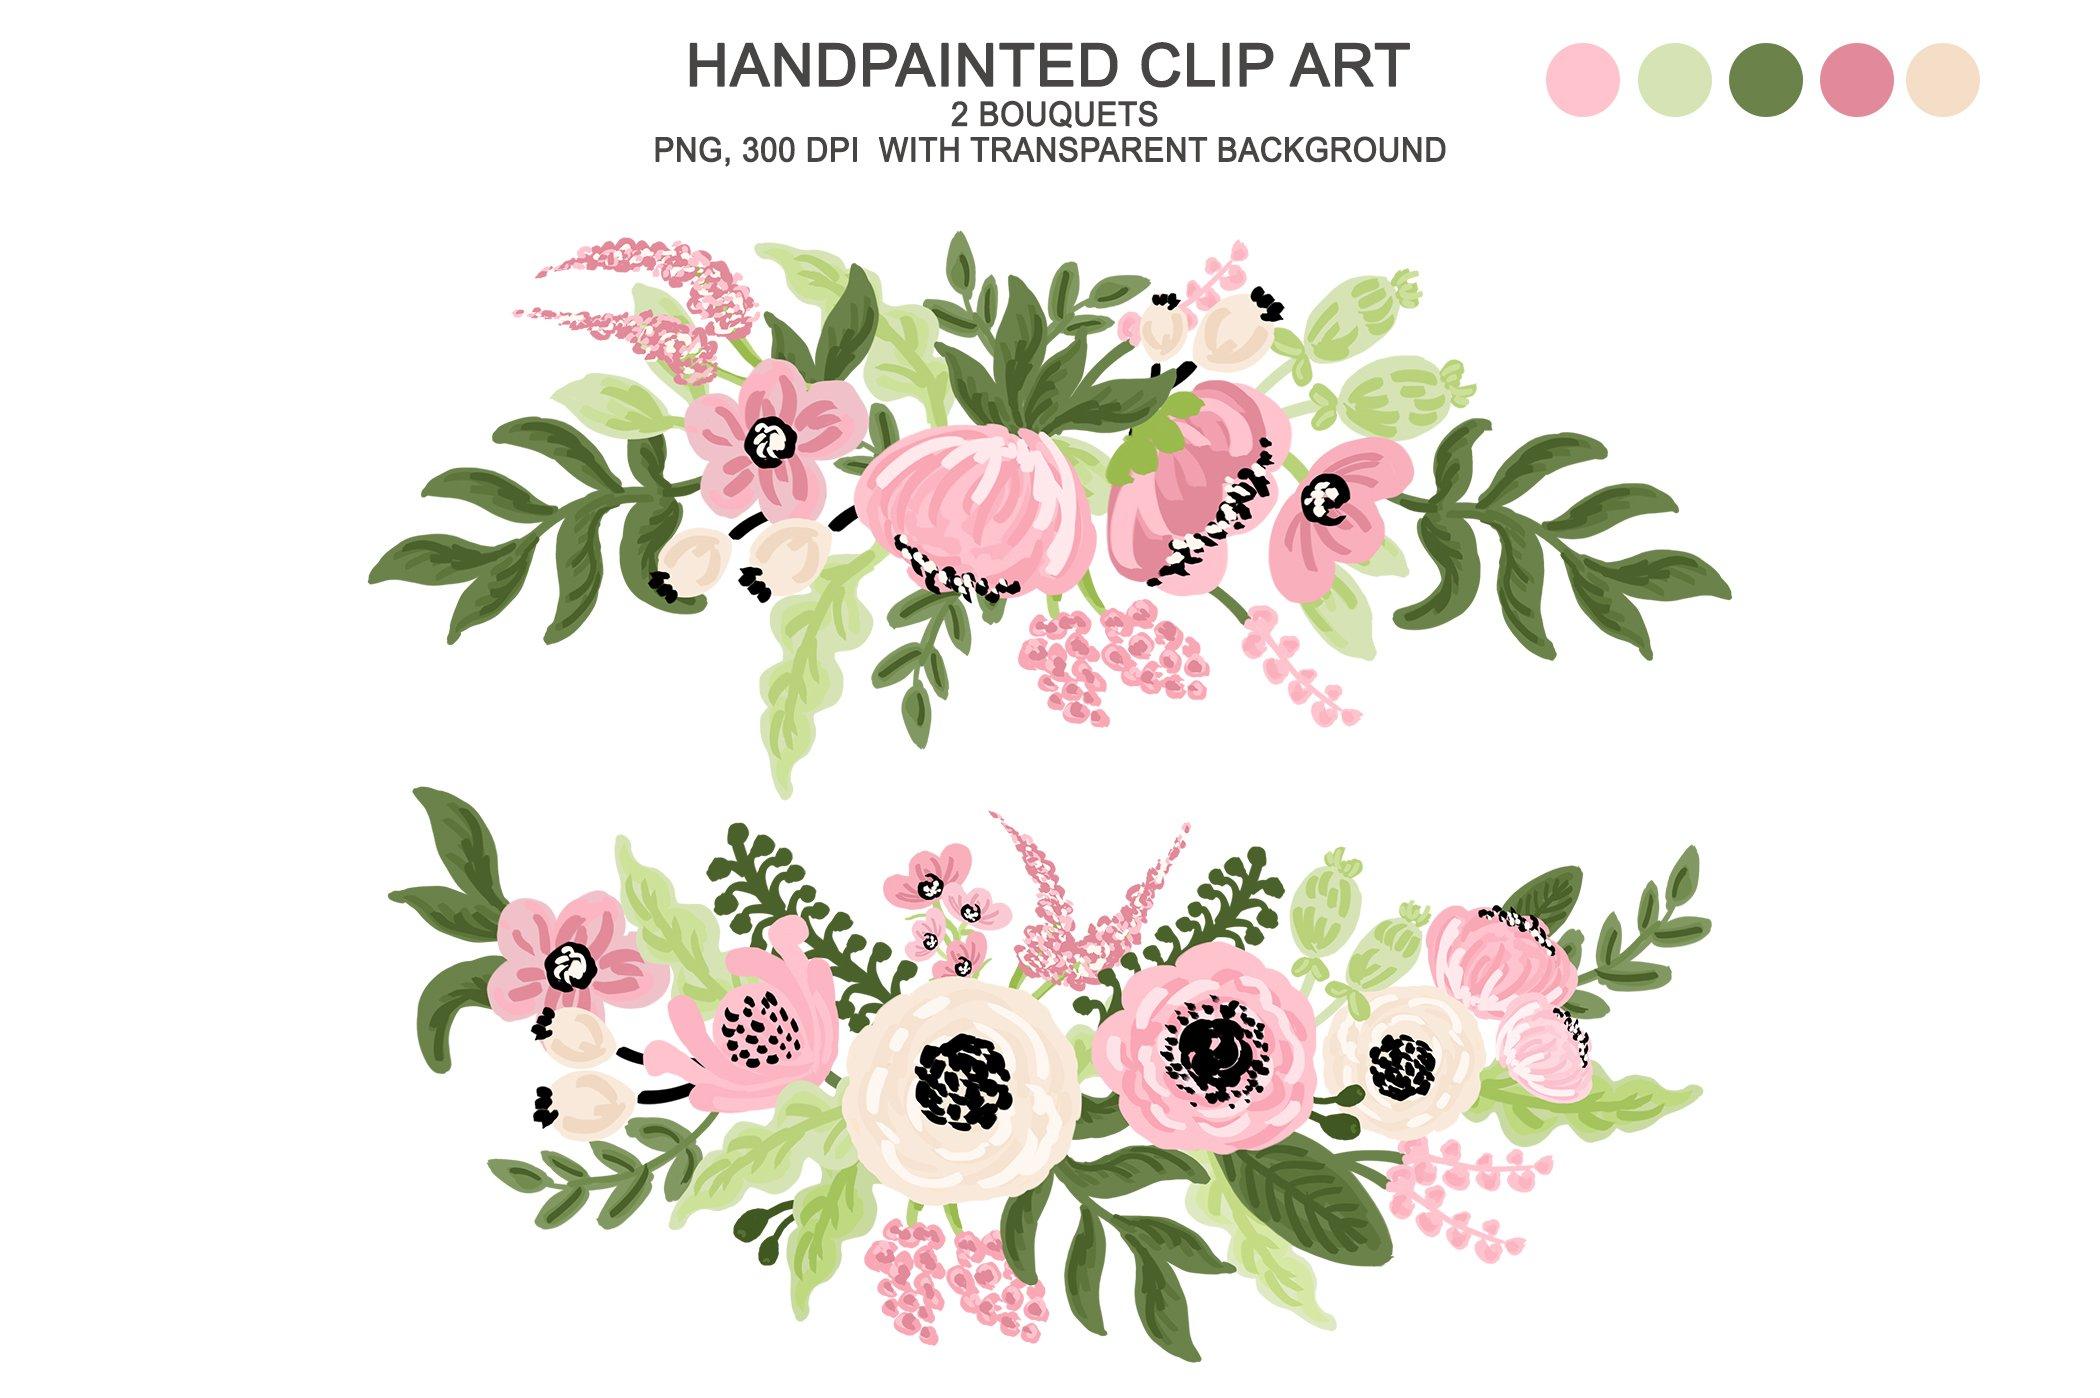 Digital Watercolor Flower Clipart | Custom-Designed ...